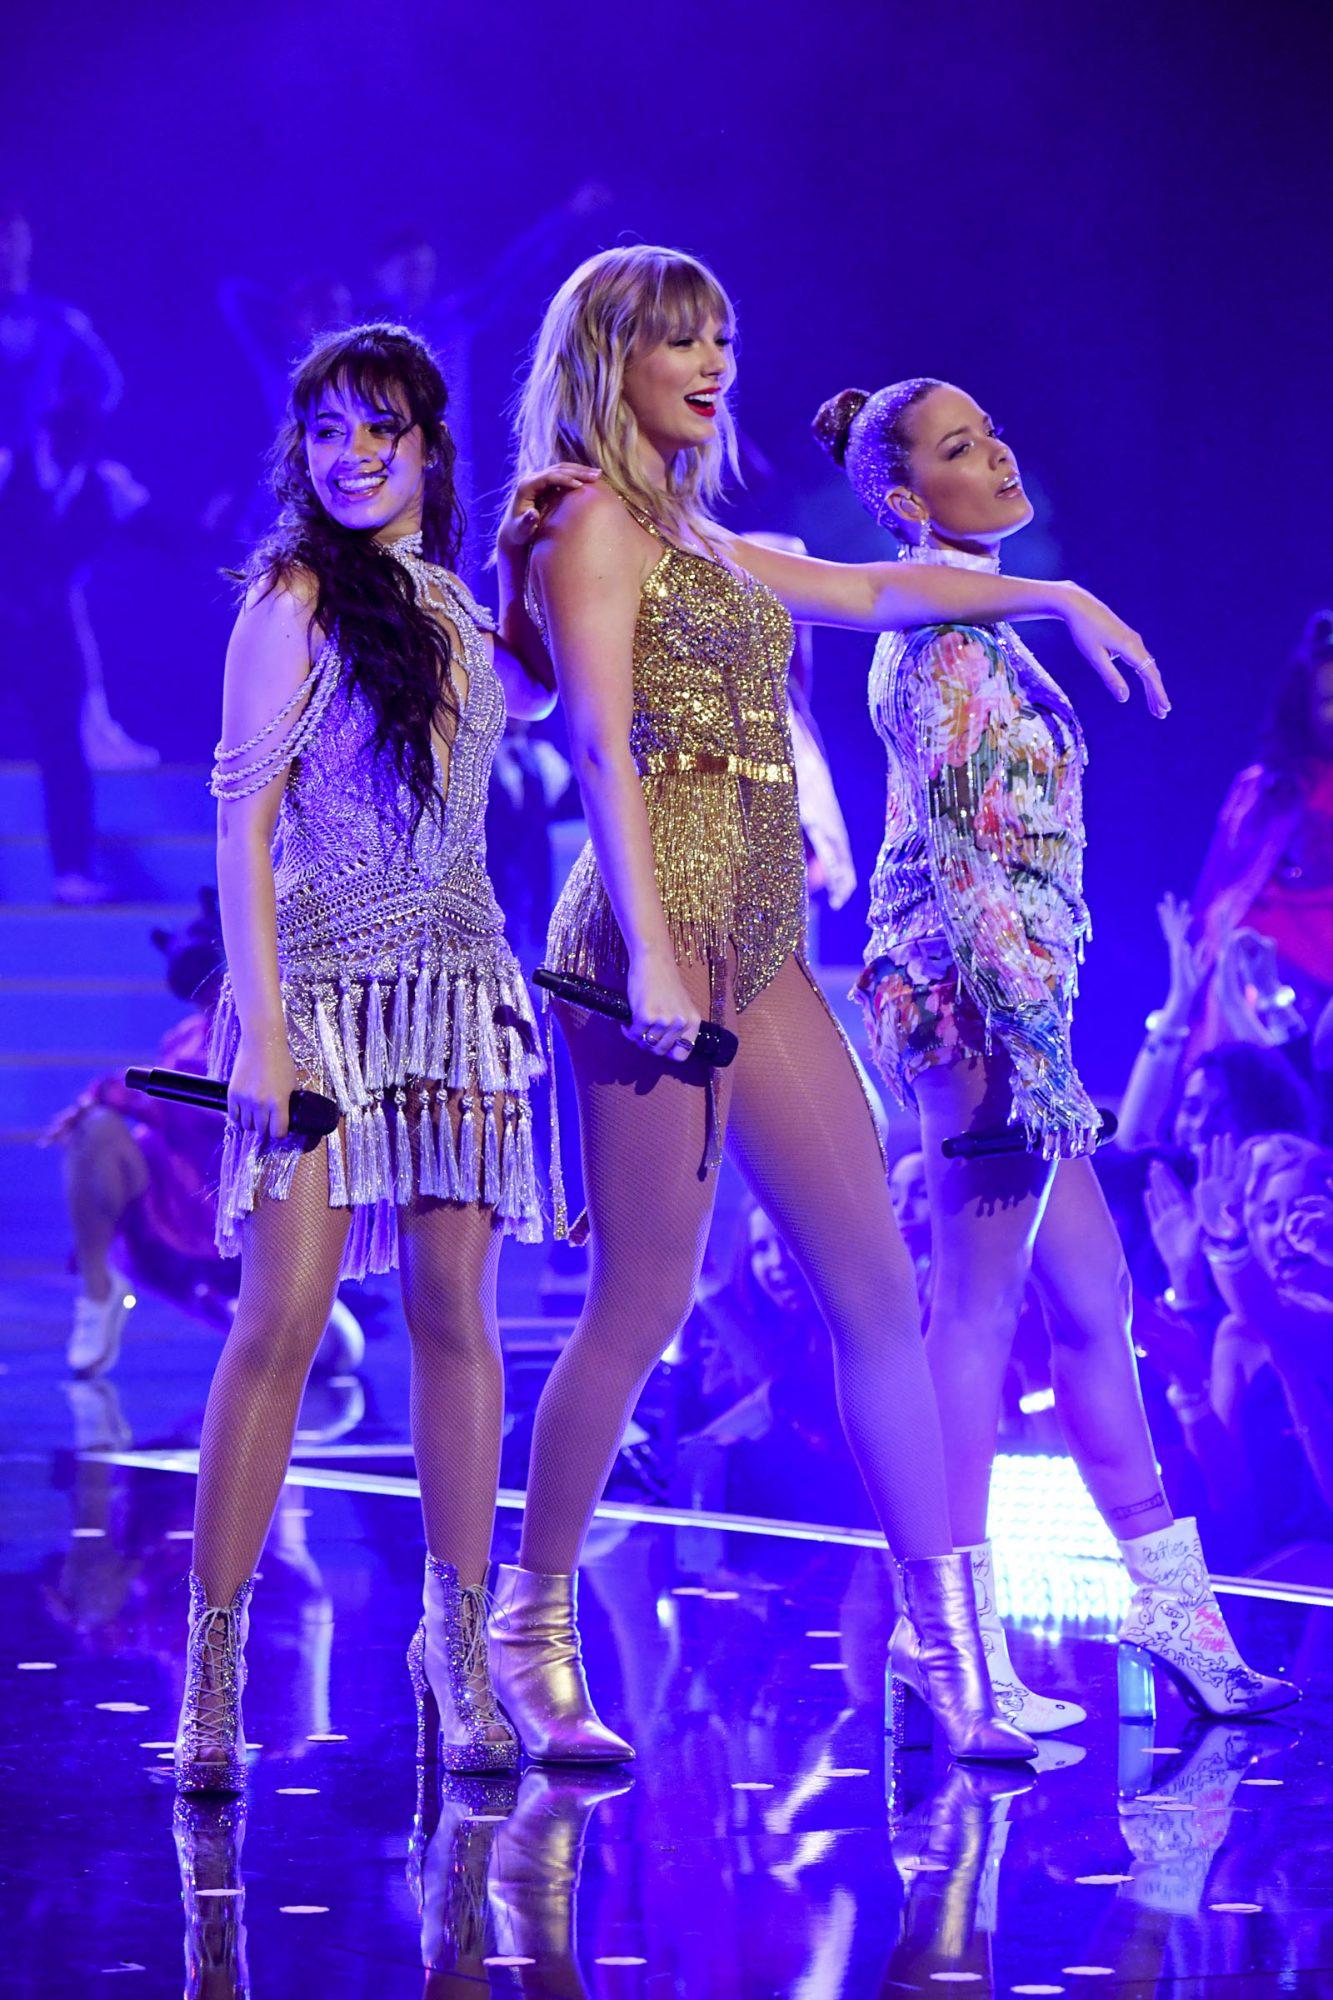 Camila Cabello, Taylor Swift, and Halsey